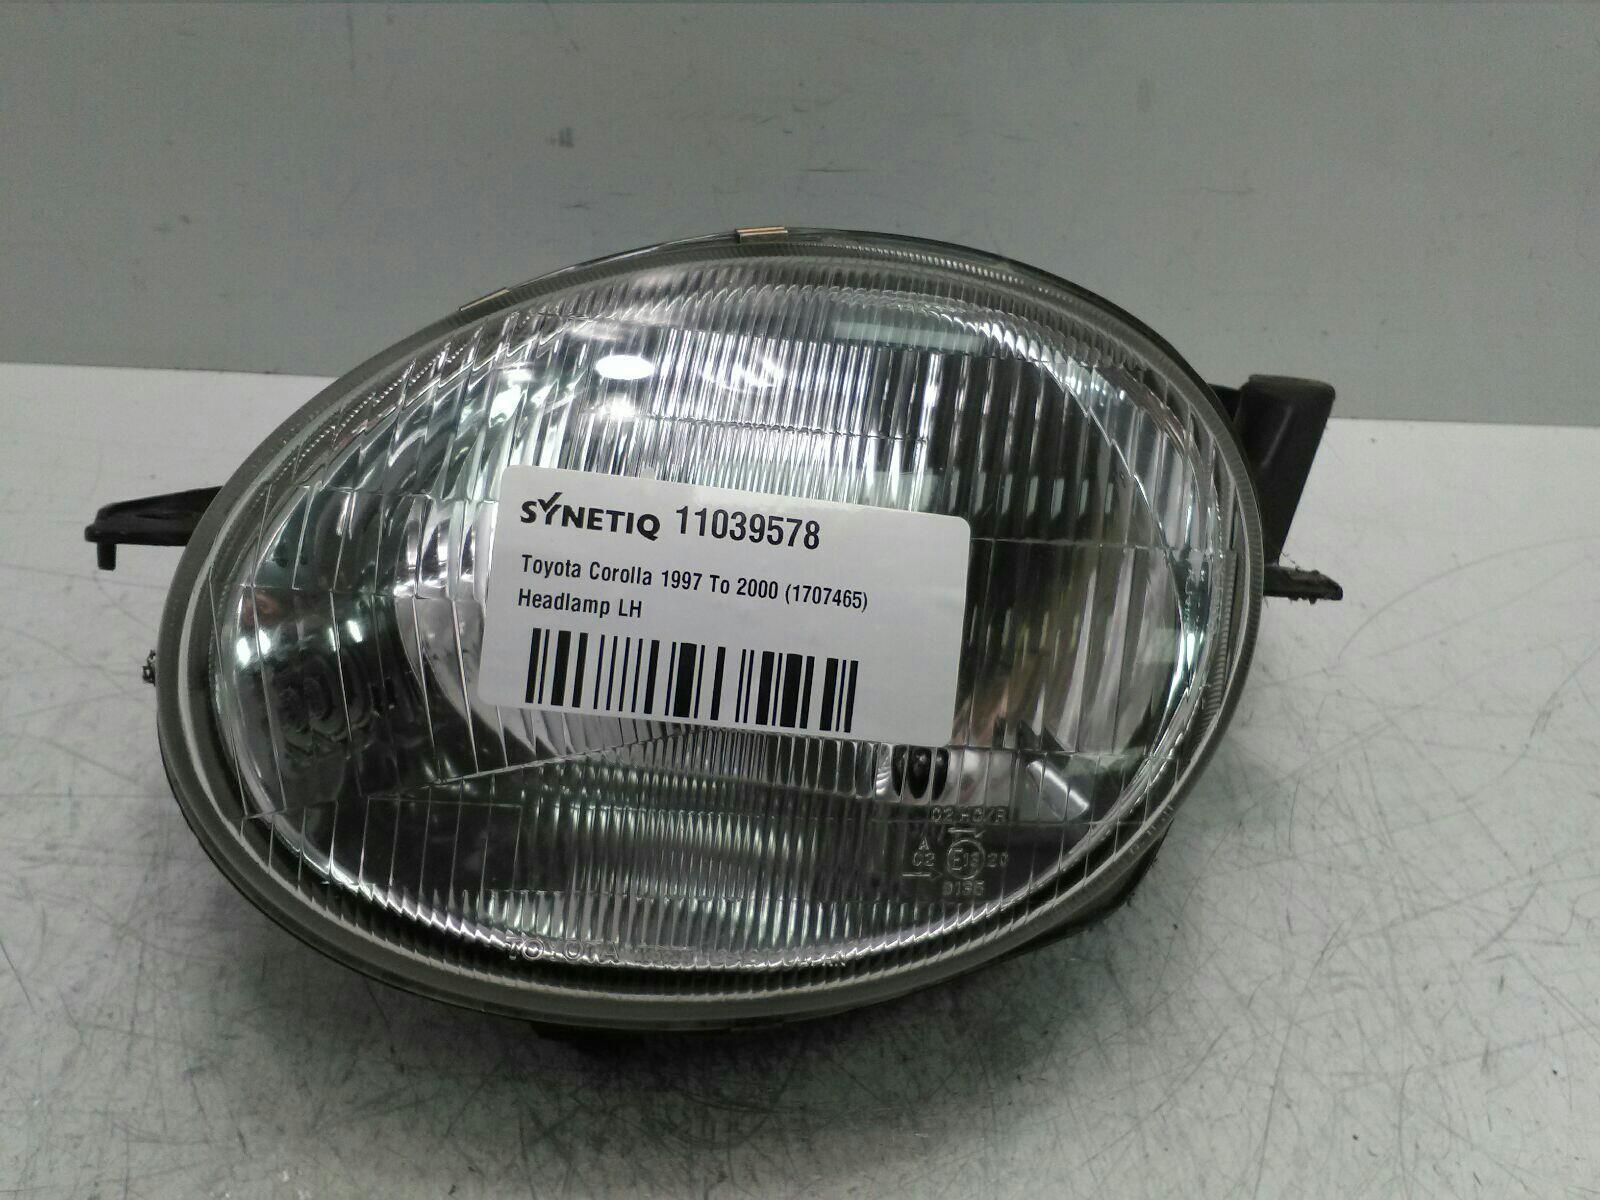 Toyota Corolla 1997 To 2000 Headlamp Lh Petrol Automatic